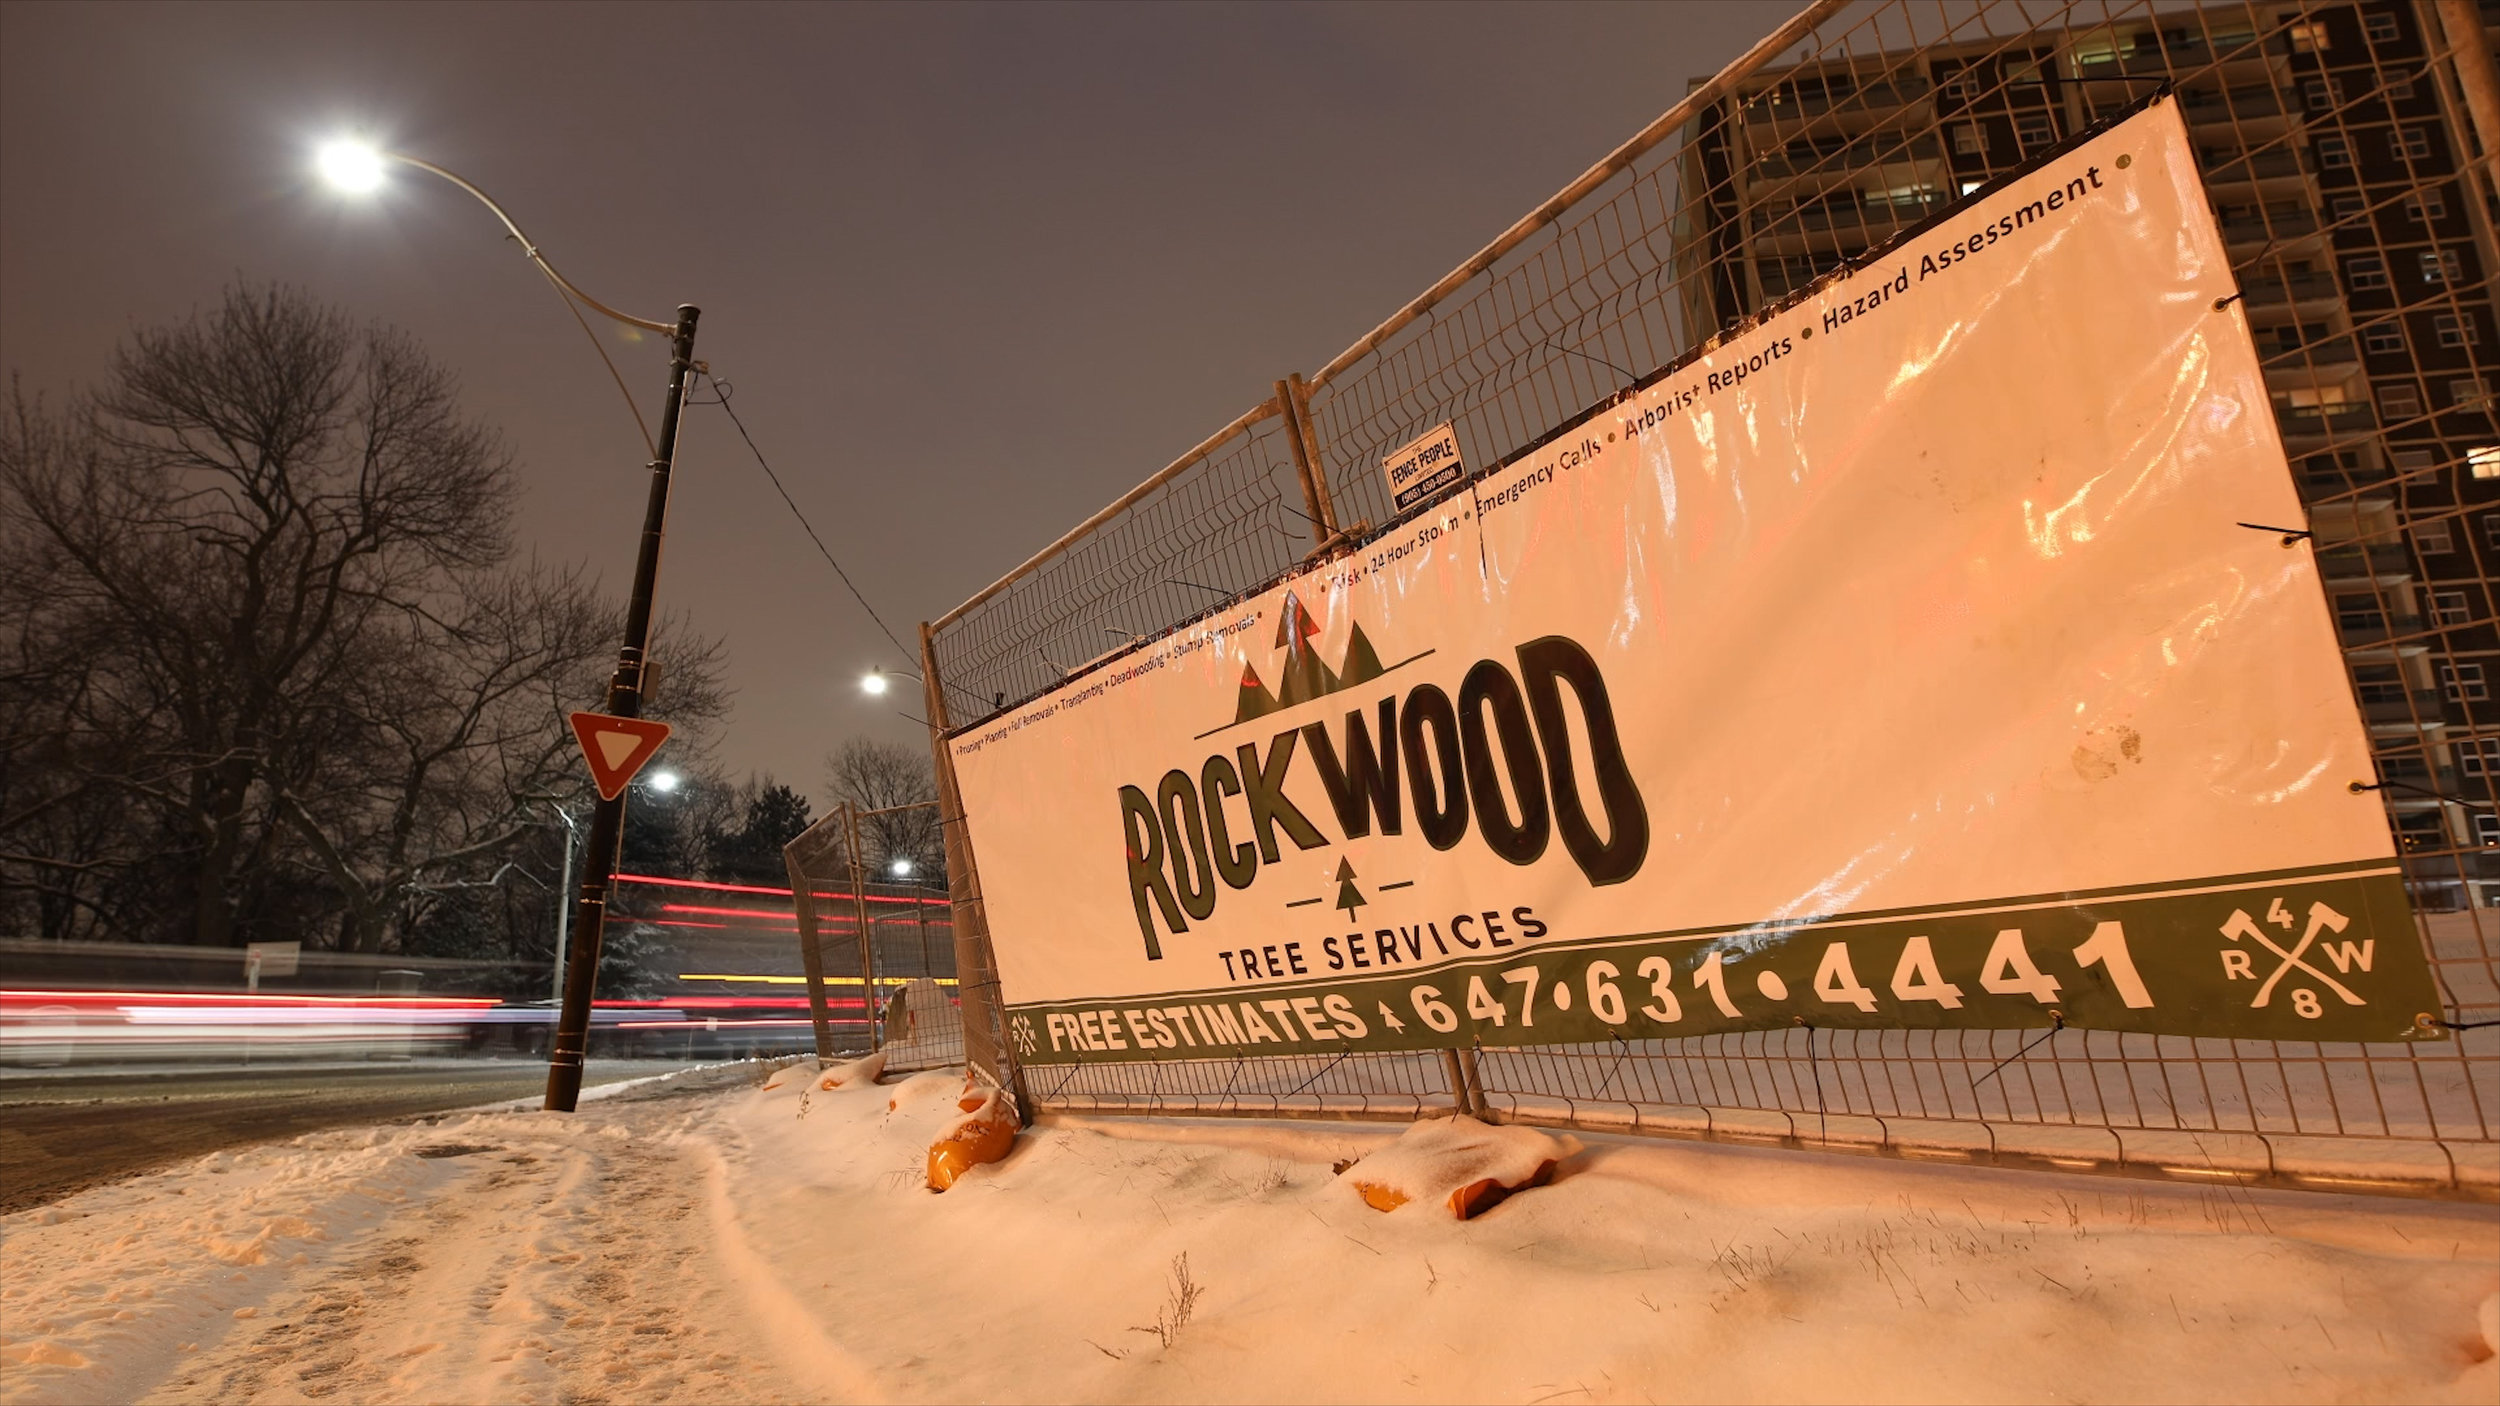 Rockwood Tree Services Toronto (13).jpg